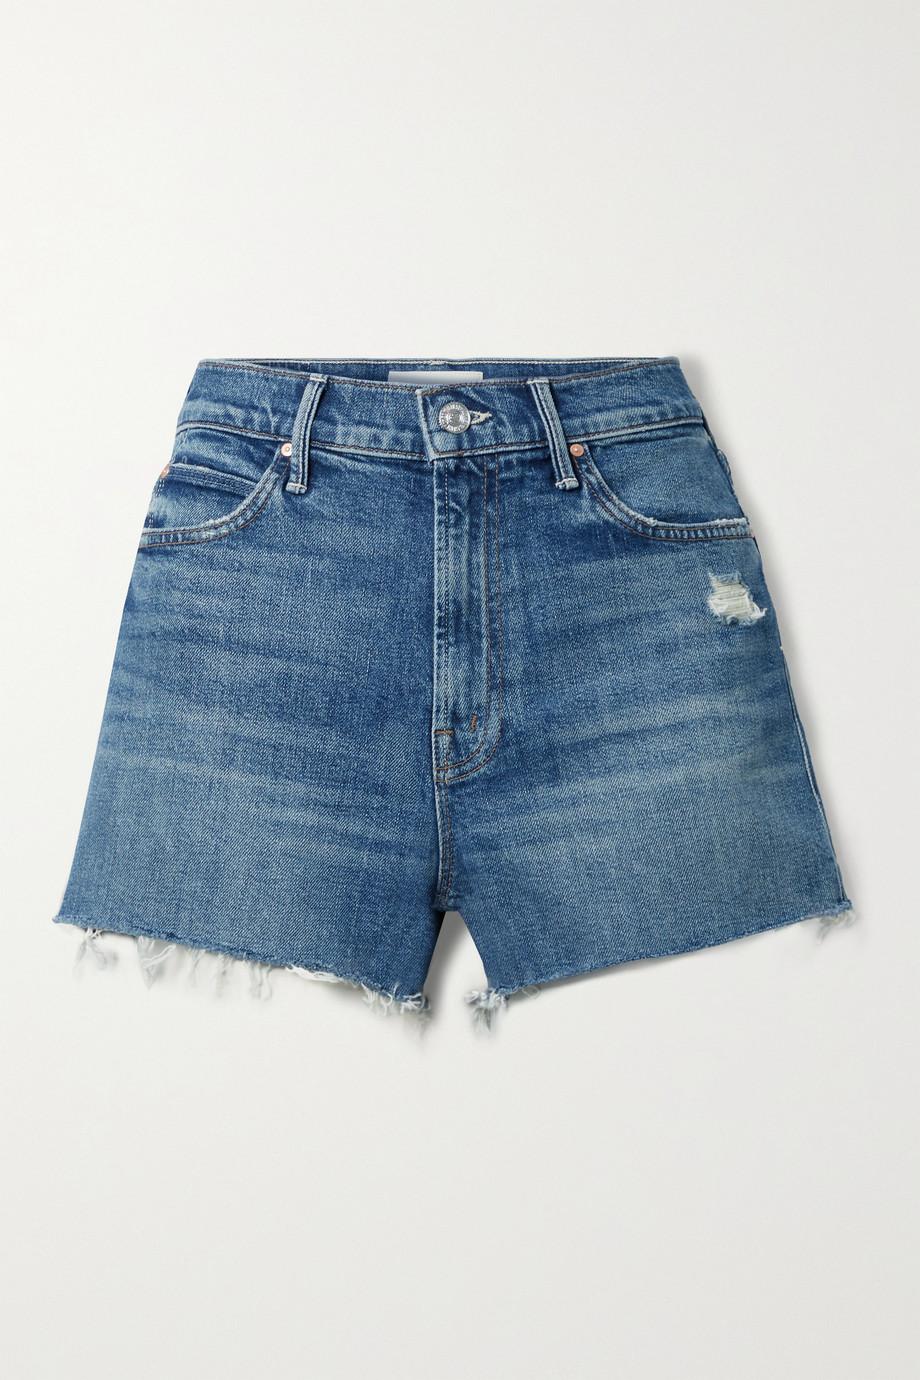 MOTHER The Dutchie distressed denim shorts